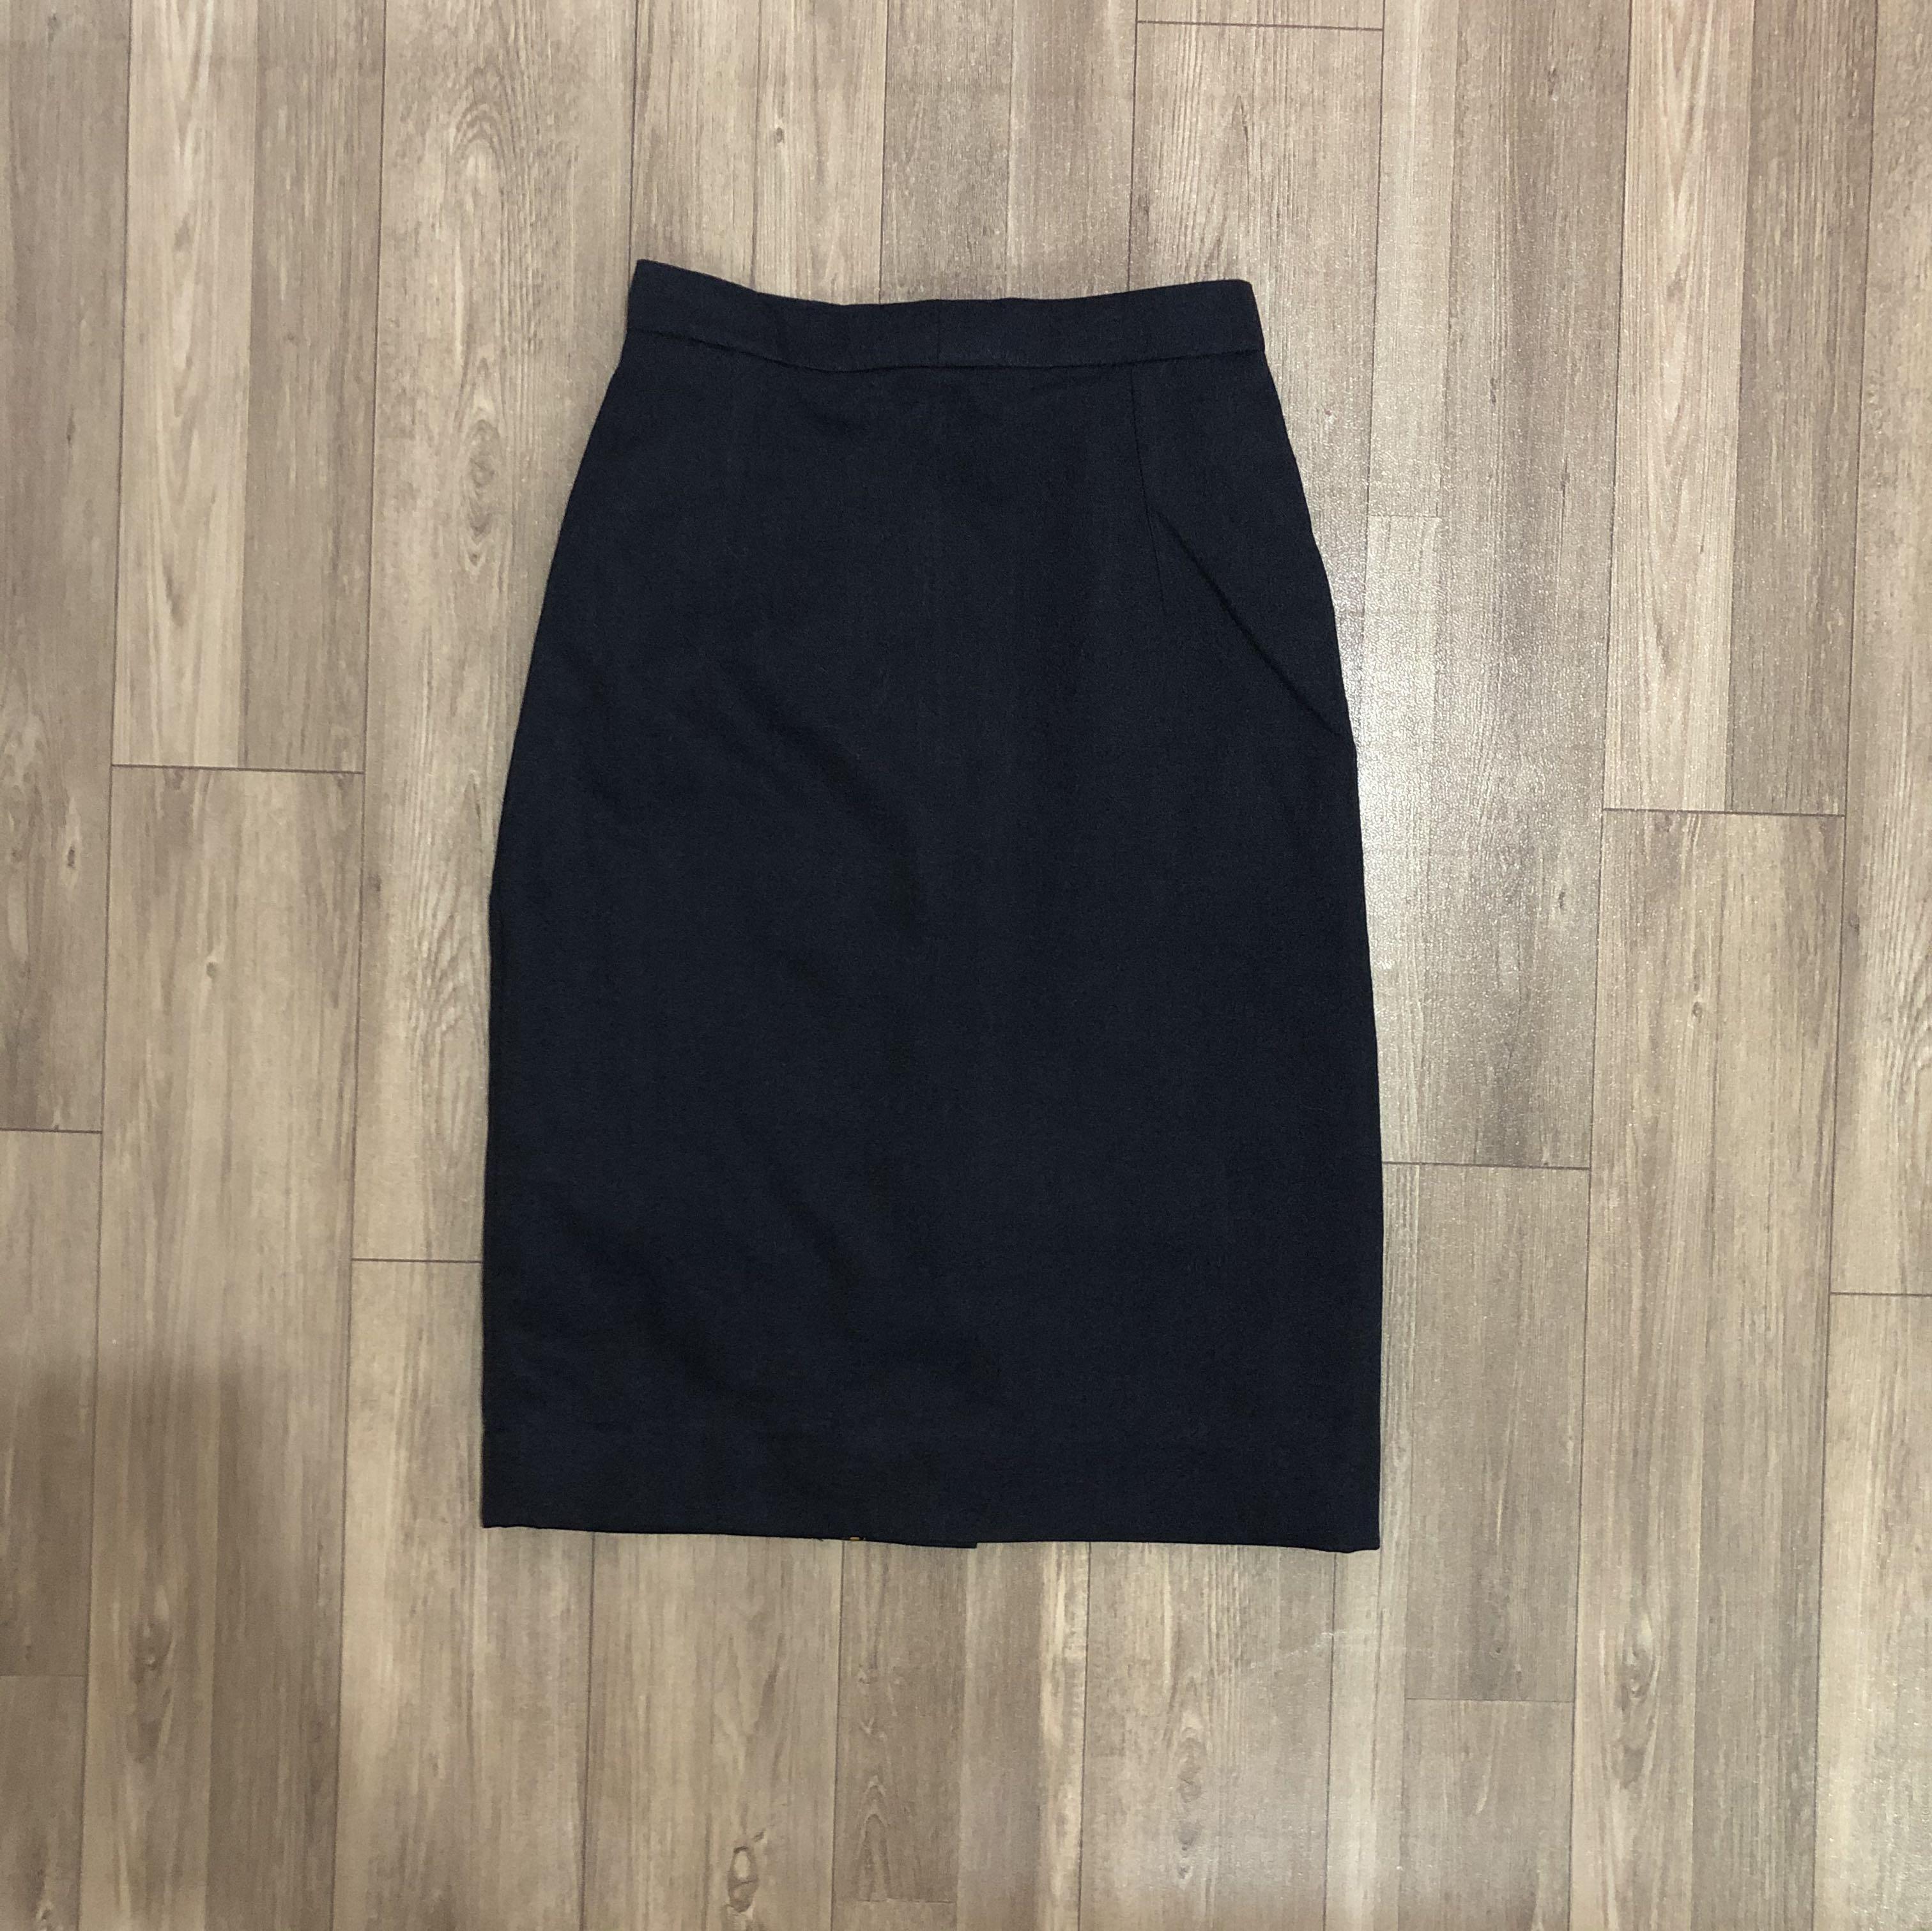 Skirt rok dark blue office formal